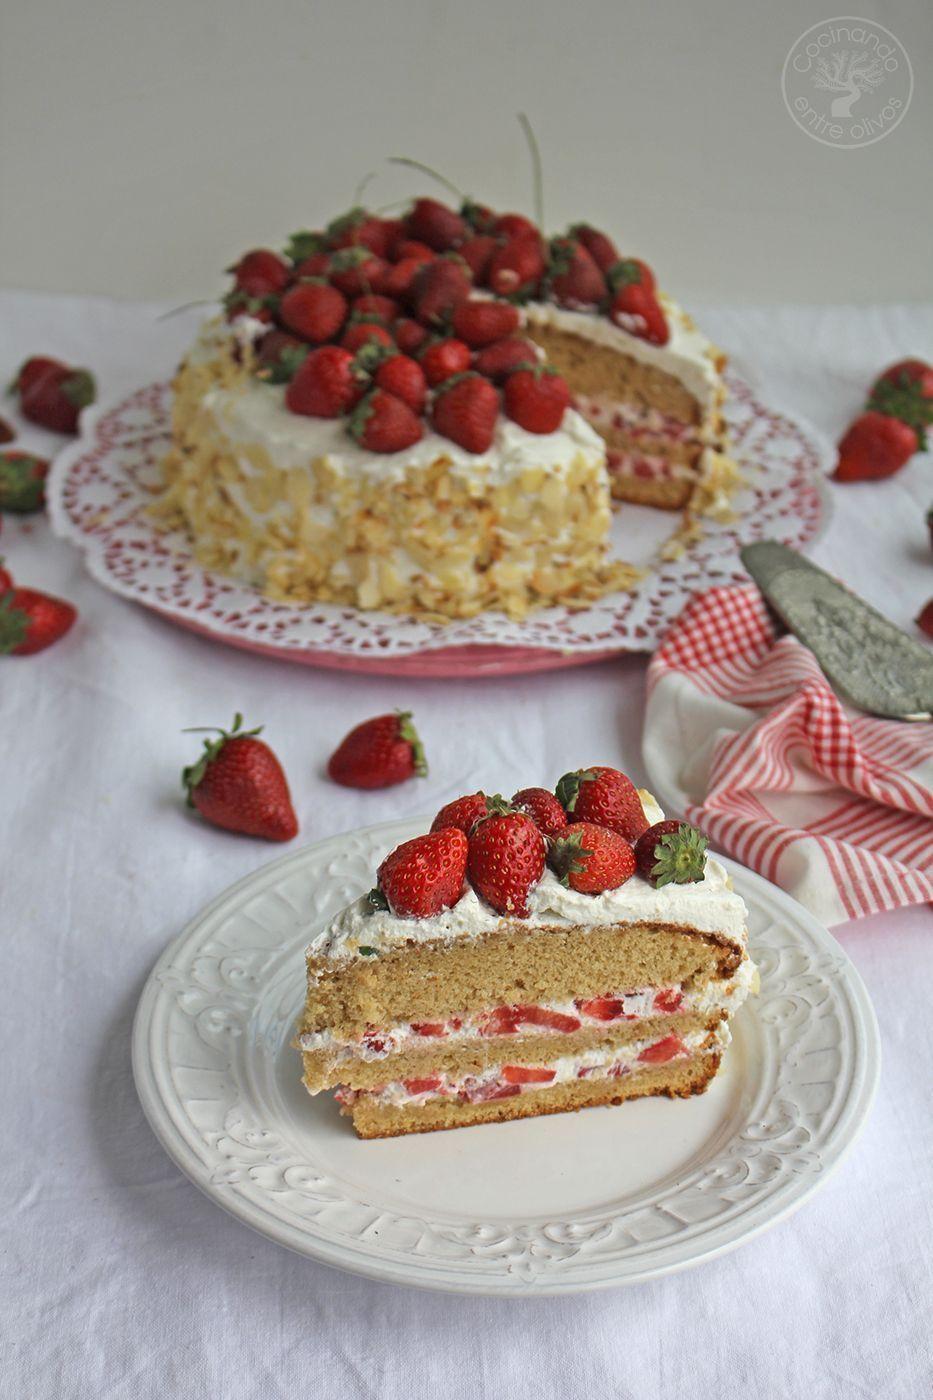 Tarta de fresas con nata www.cocinandoentreolivos.com (30)